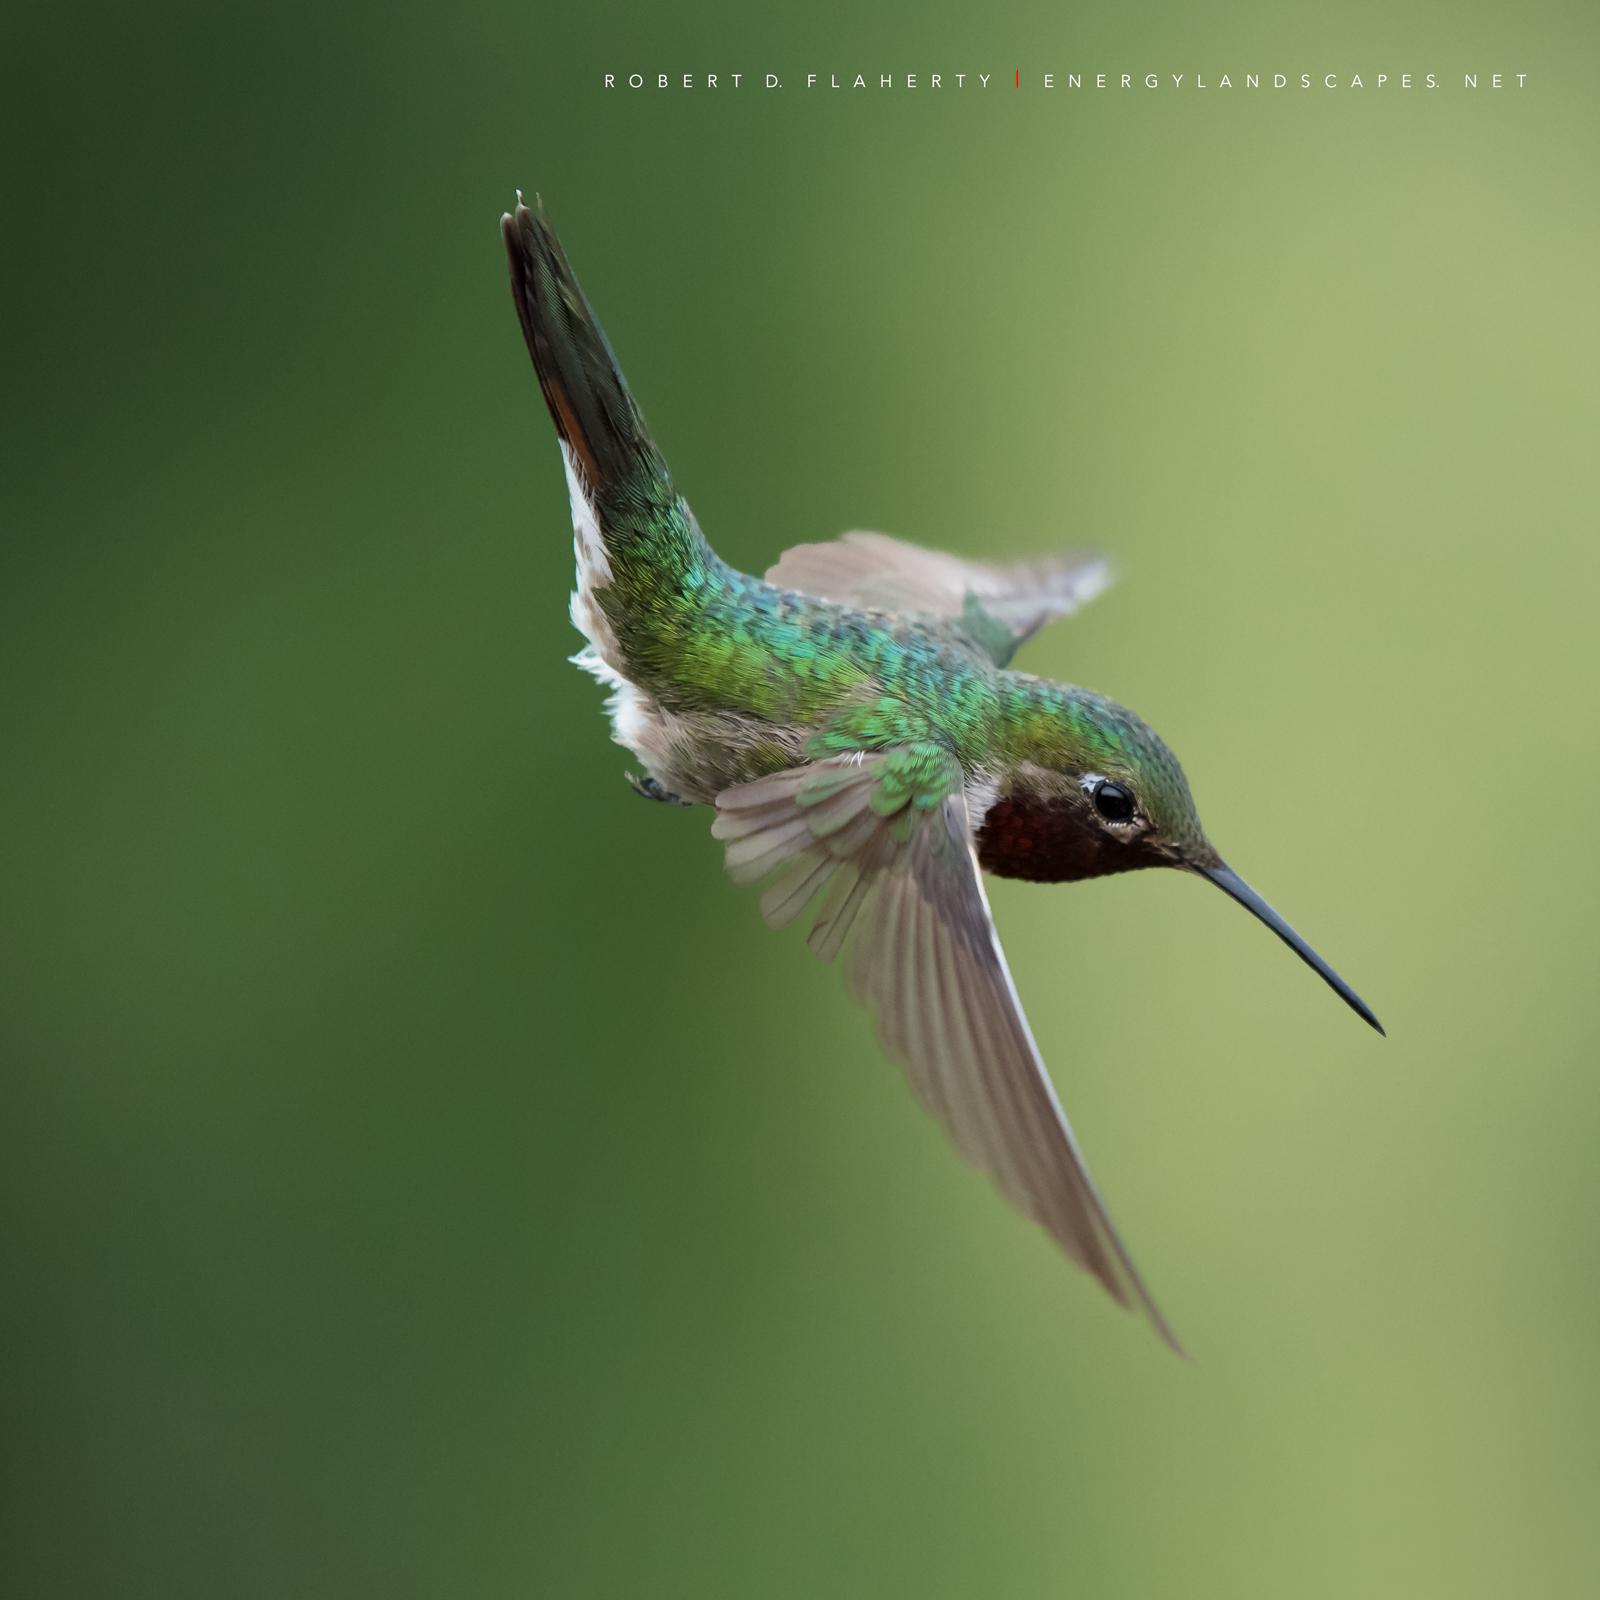 hummingbird, hummingbirds, fine art photography, New Mexico, South Central Mountains, monsoon, Ruidoso, Ruidoso New Mexico, rain, Thunderstorm, fine art, New Mexico fine art landscape photography, photo